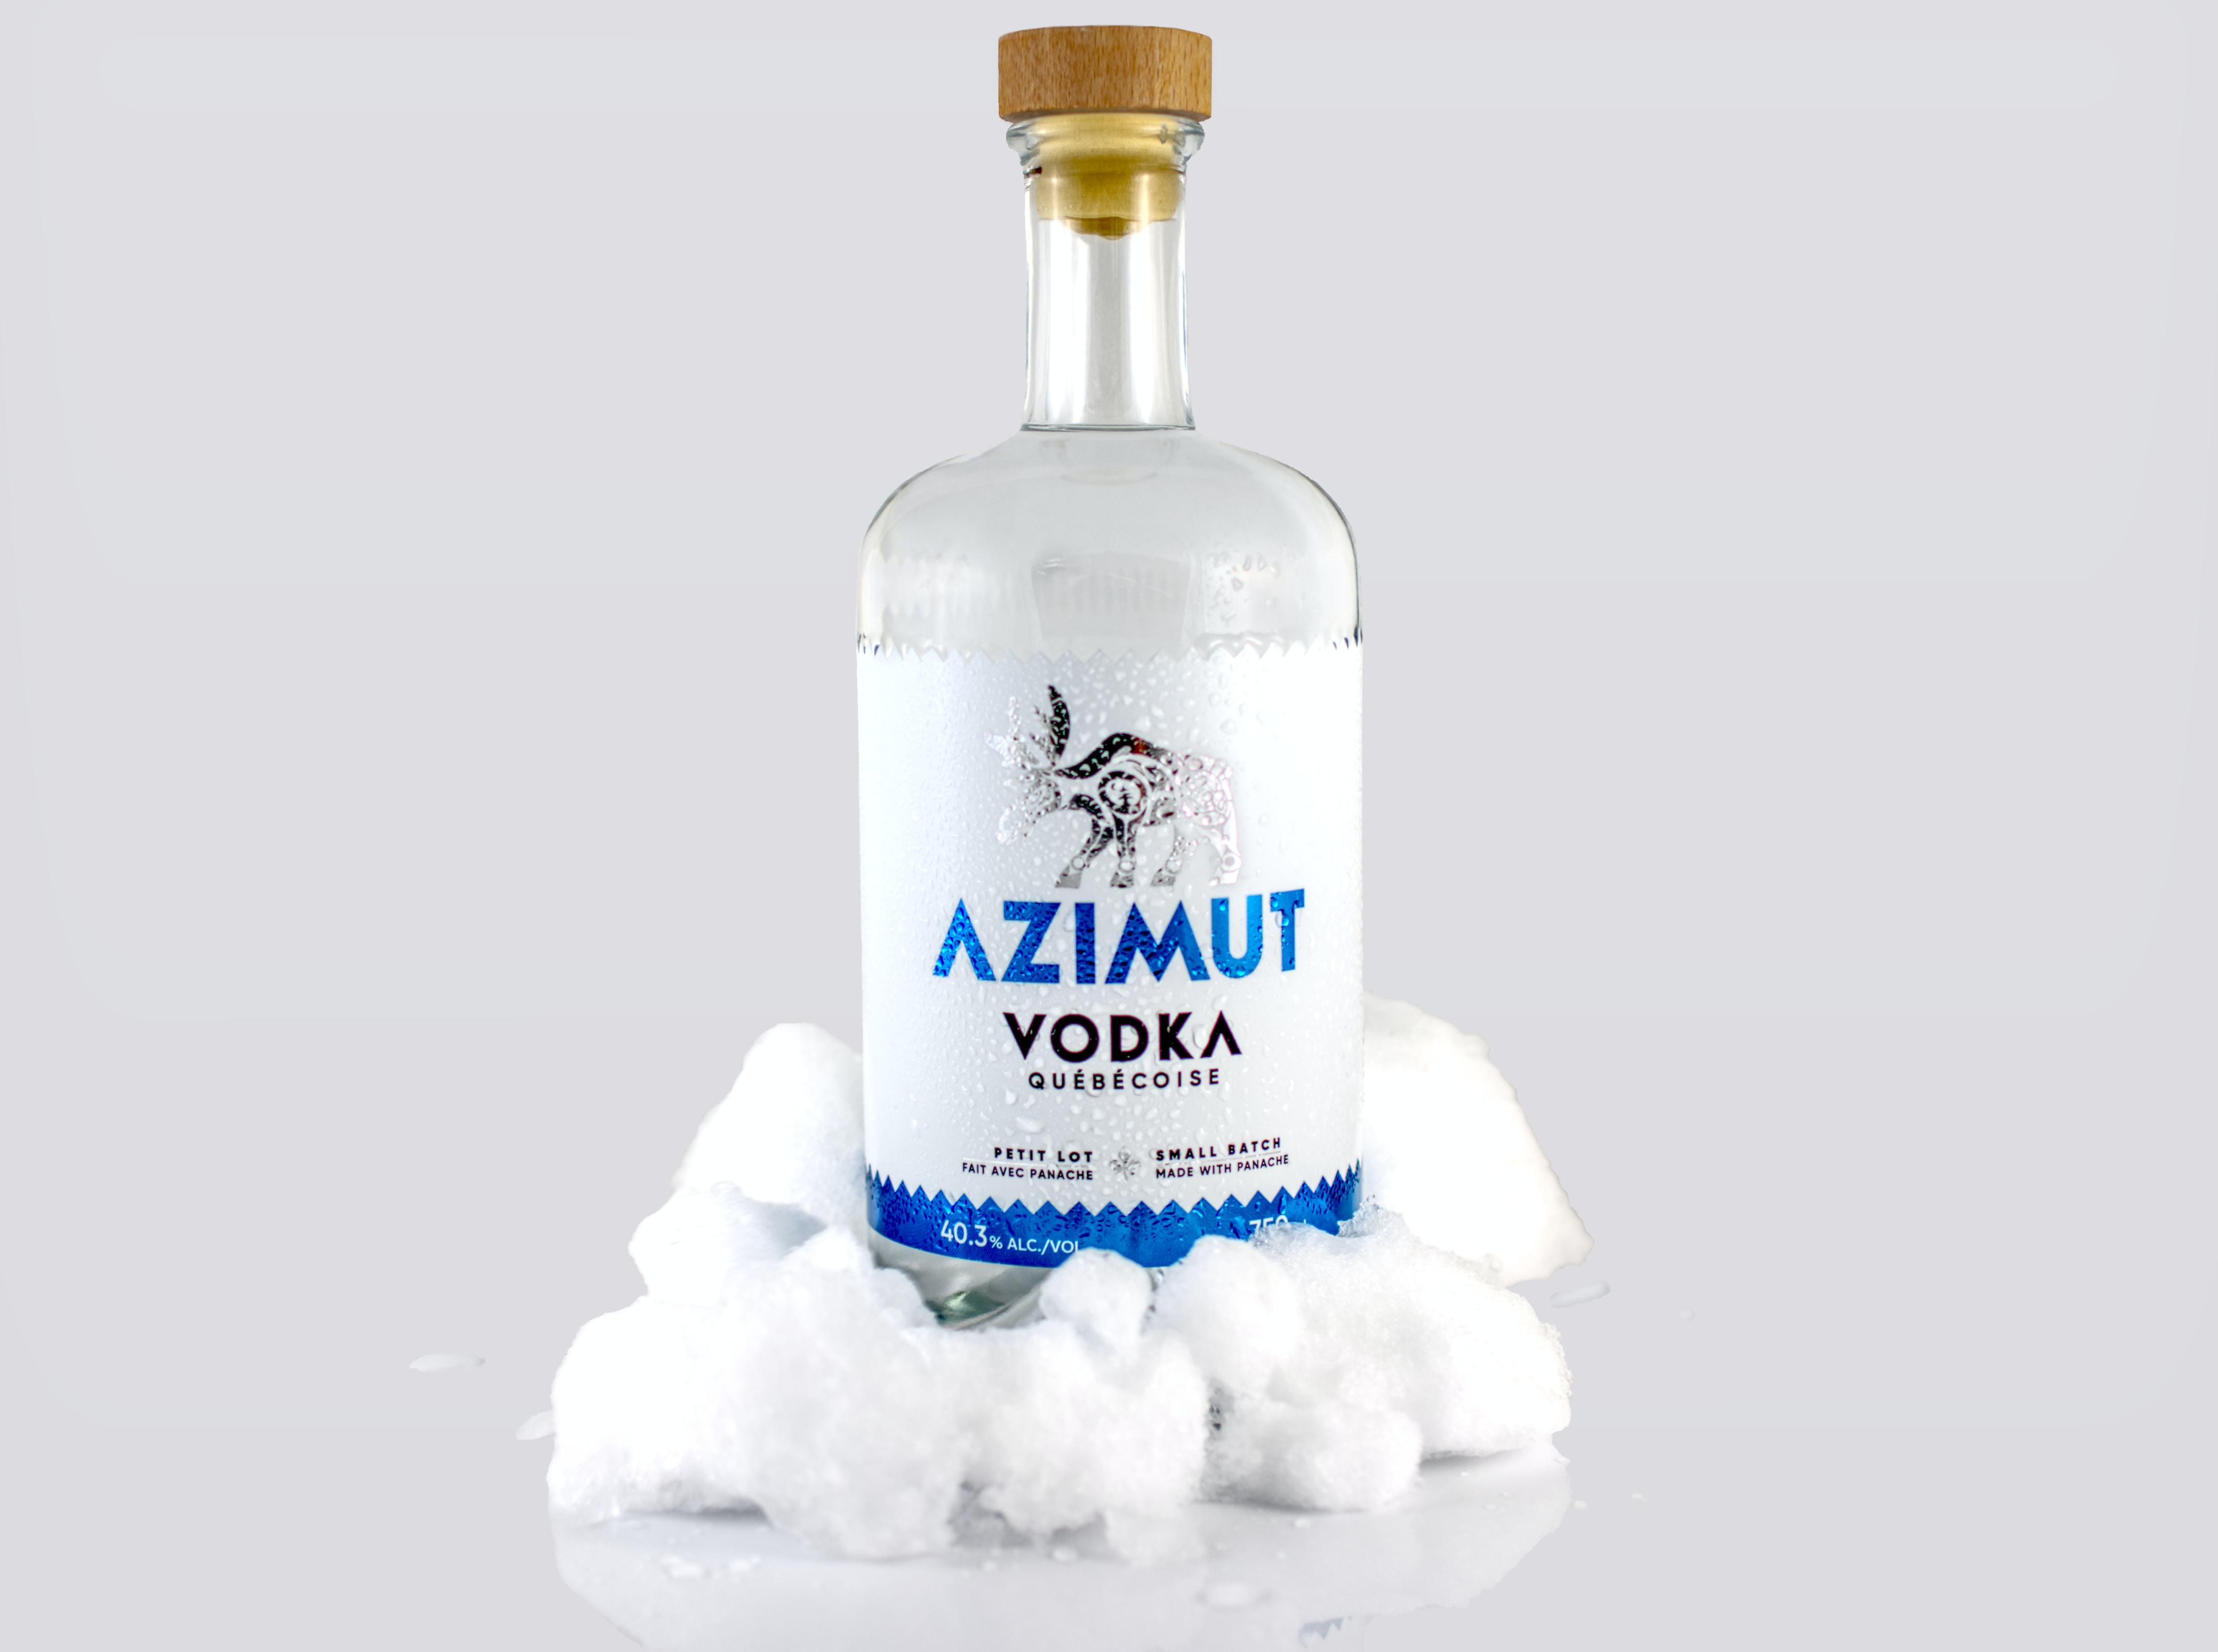 Azimut Vodka bottle